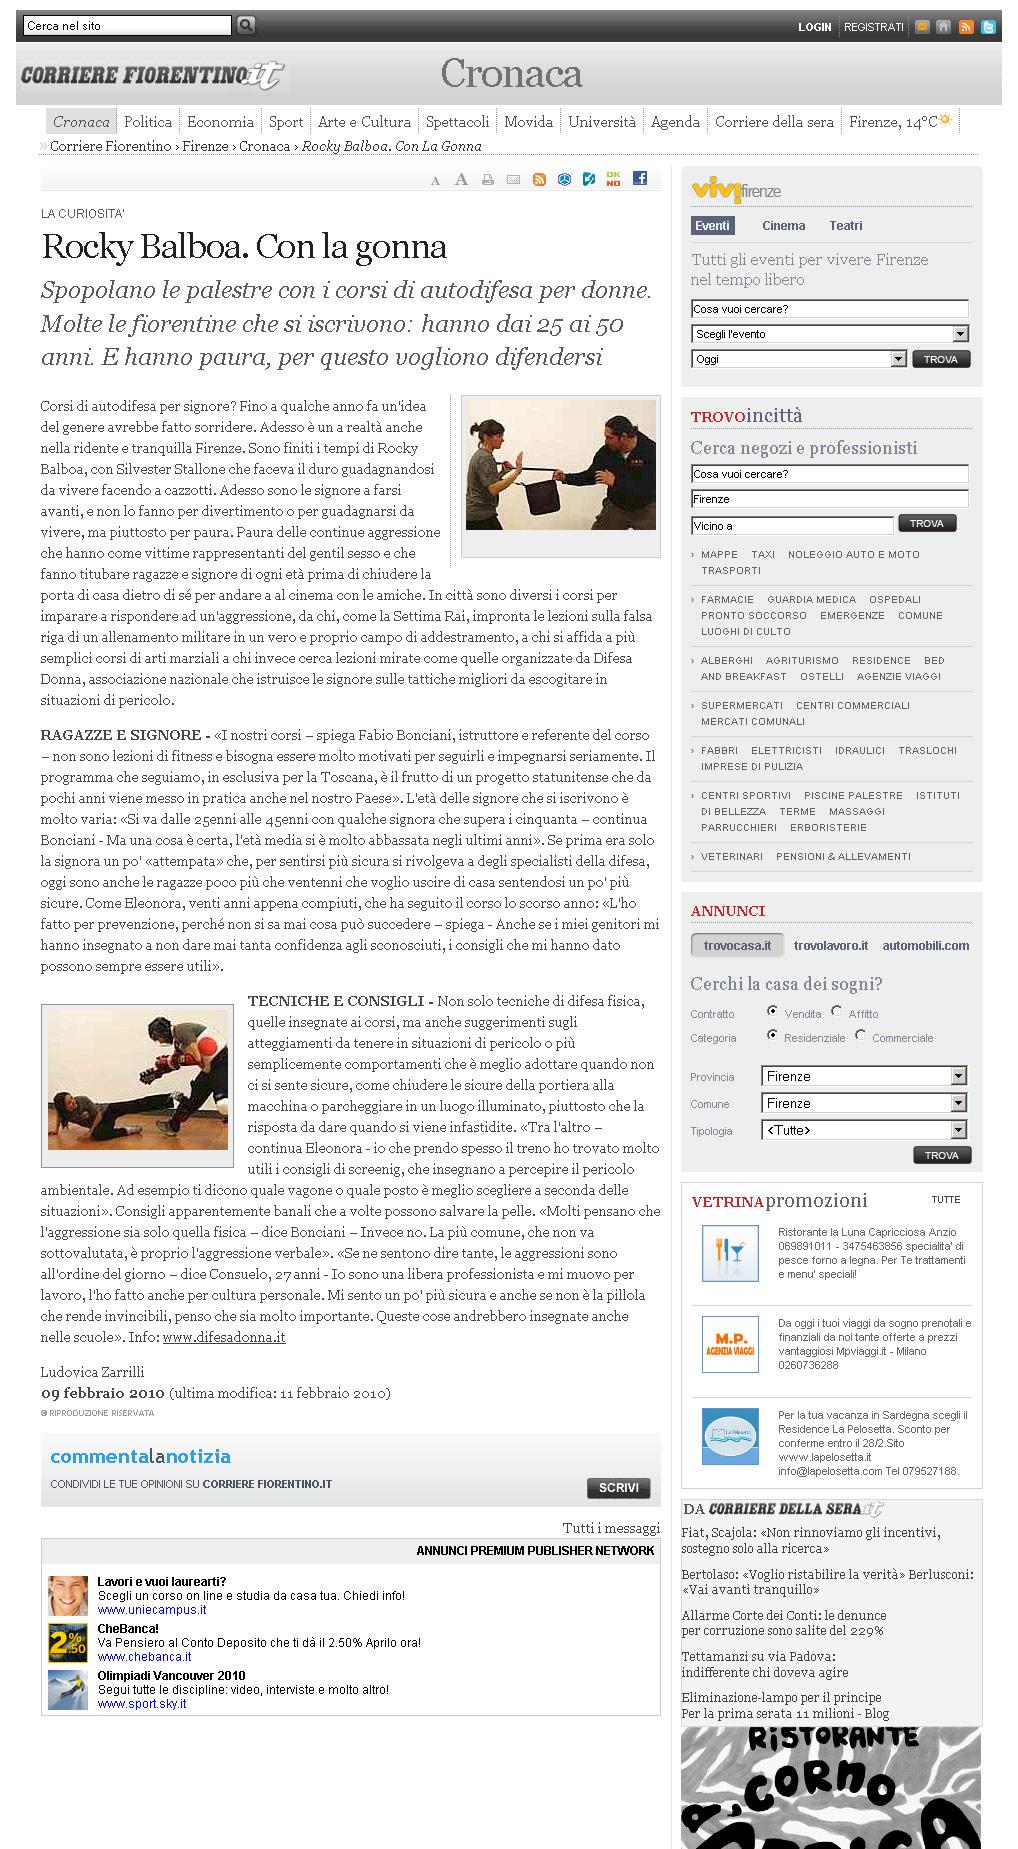 Corrierefiorentino.it – 09 Febbraio 2010